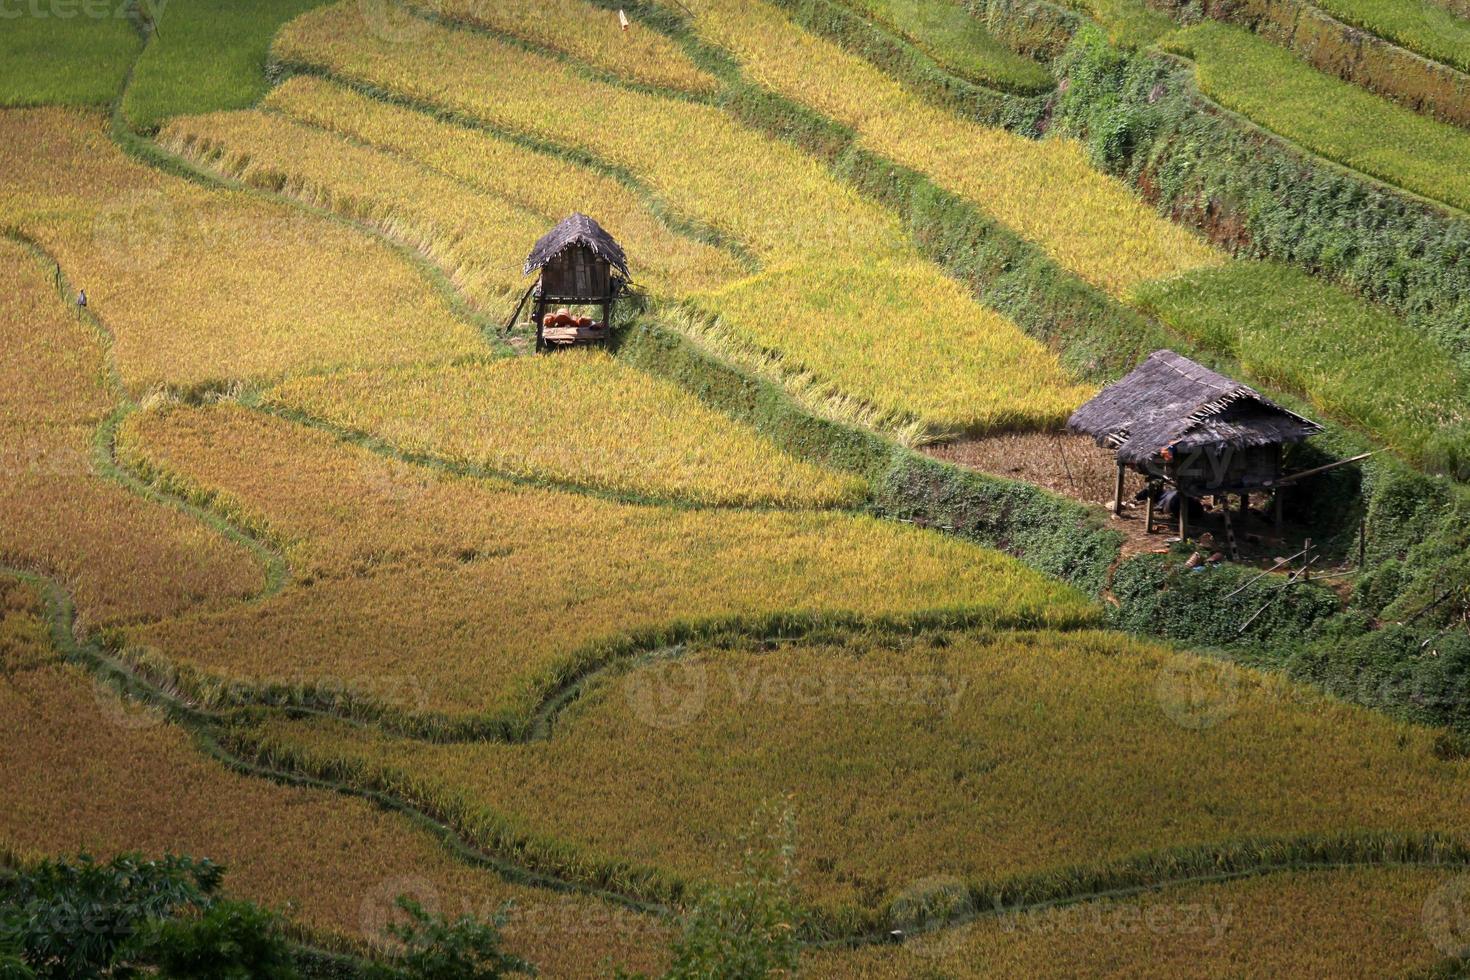 Rice Farm in Vietnam photo